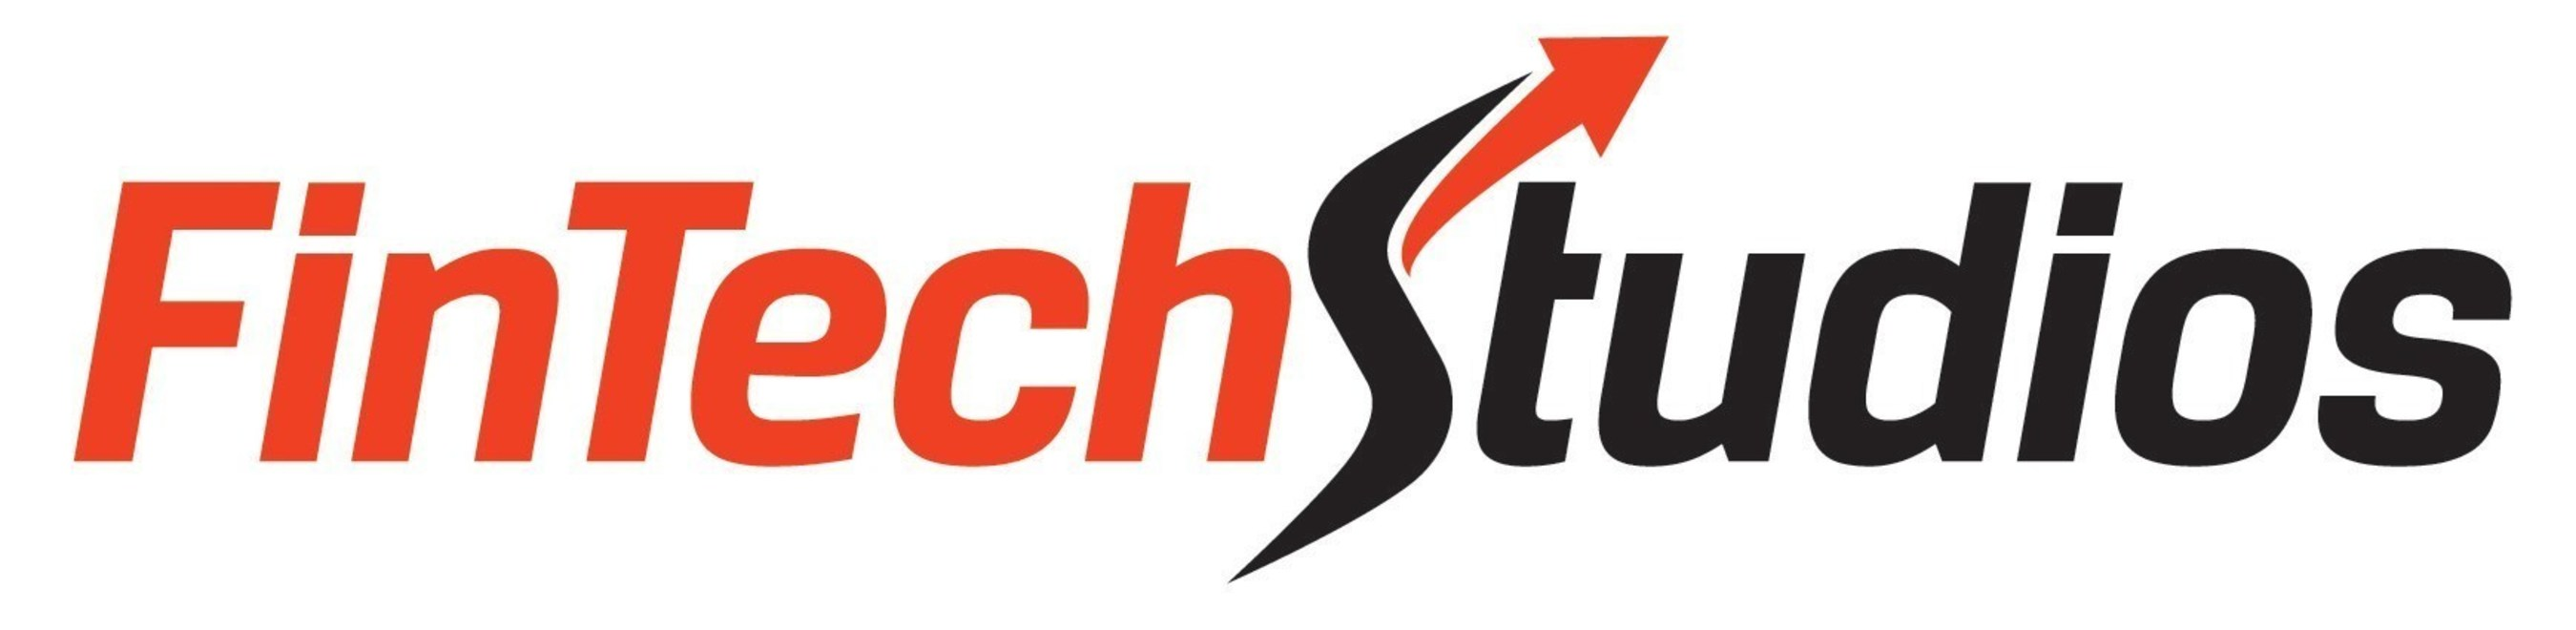 FinTech Studios Announces Symphony Partnership